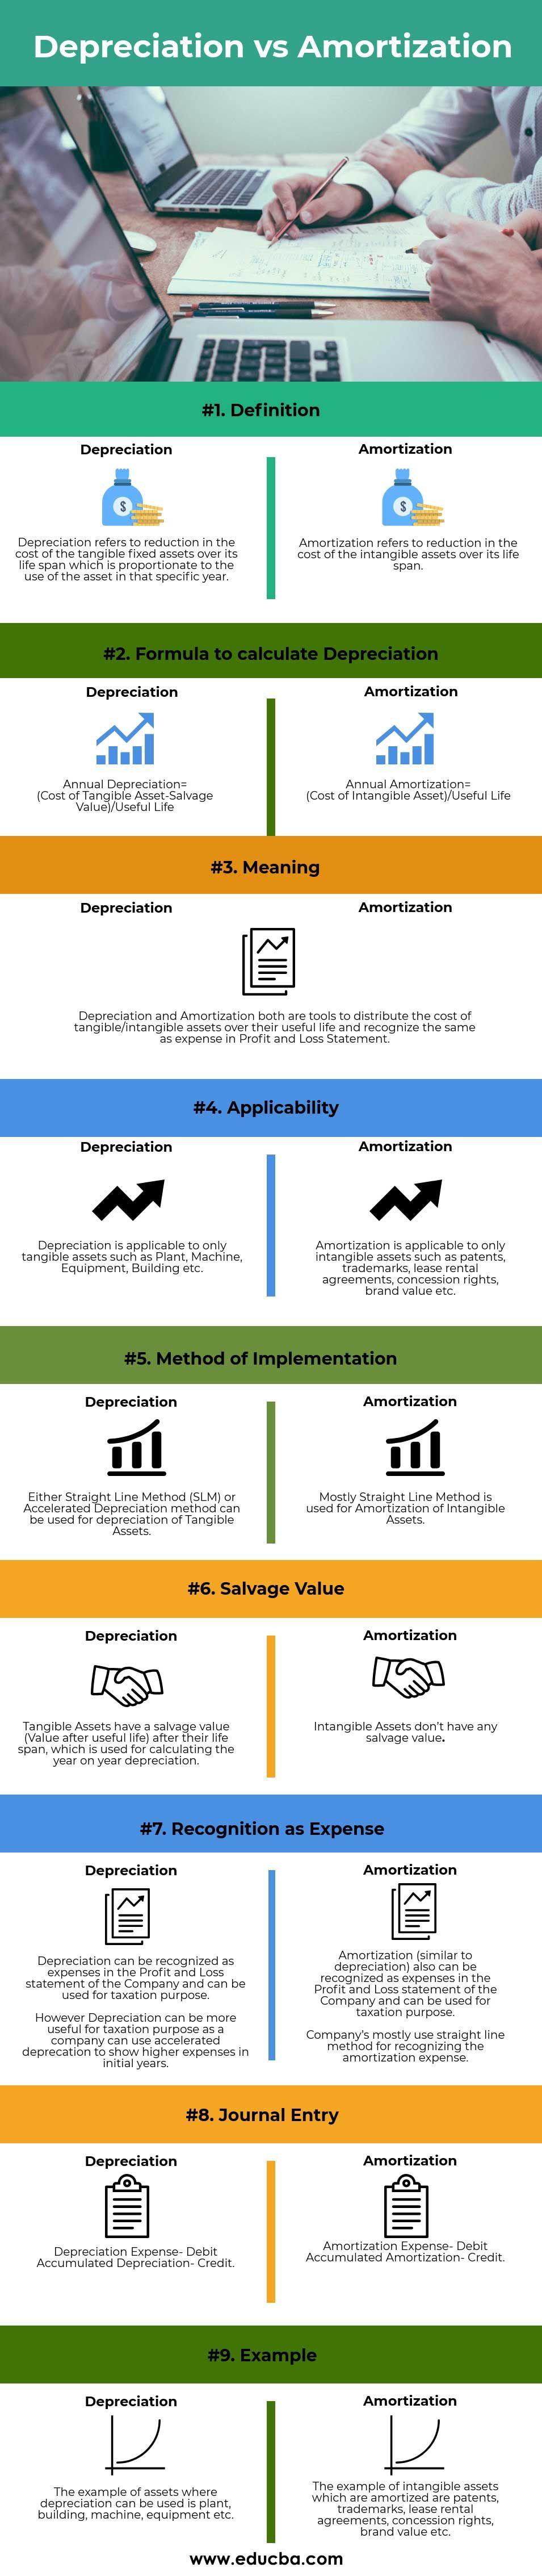 Depreciation vs Amortization Journal entries